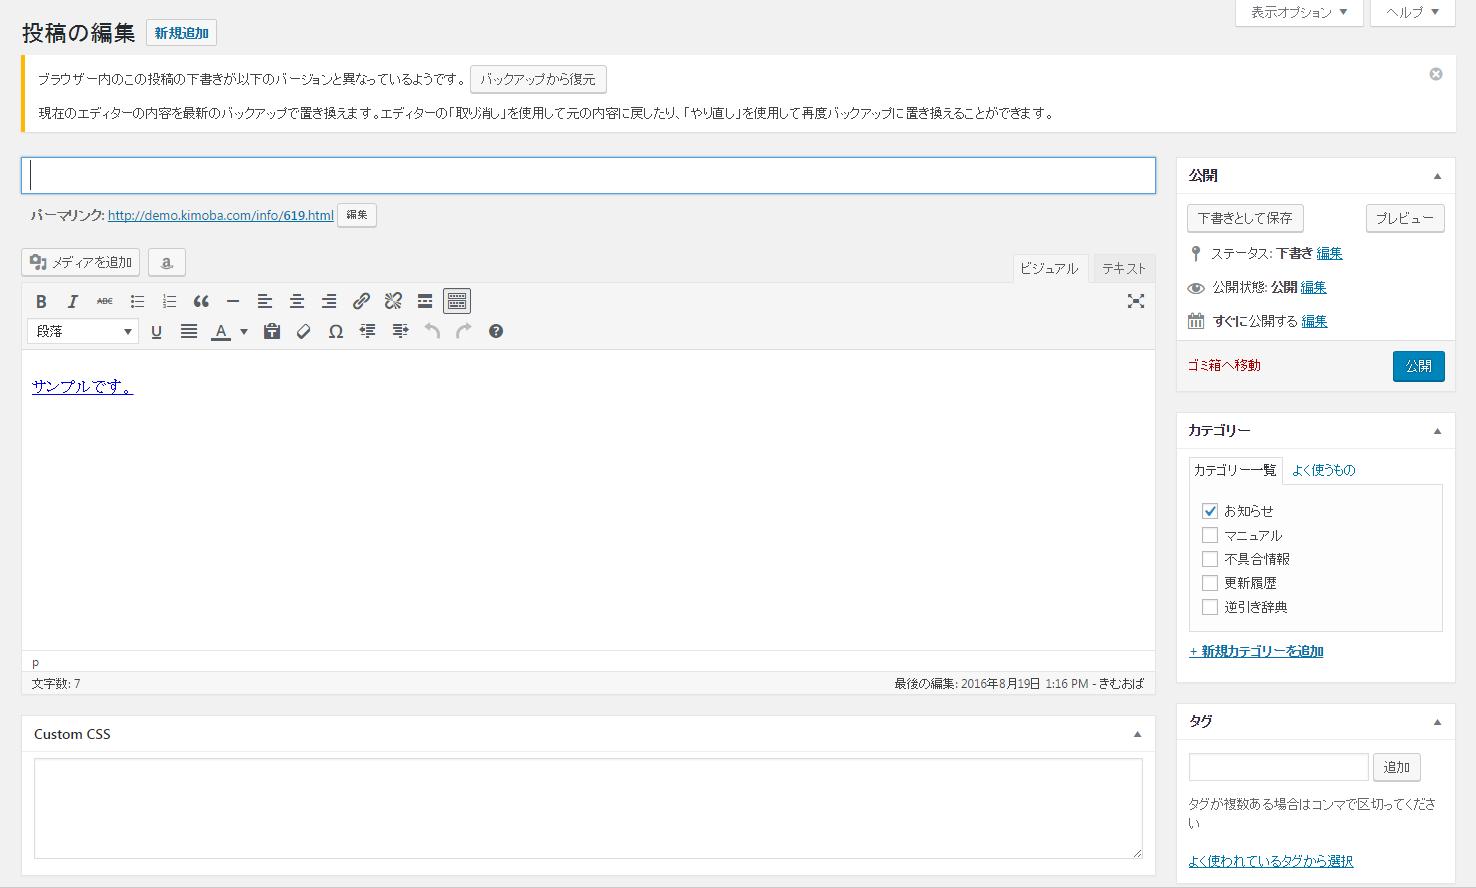 wordpress 4.6 自動保存